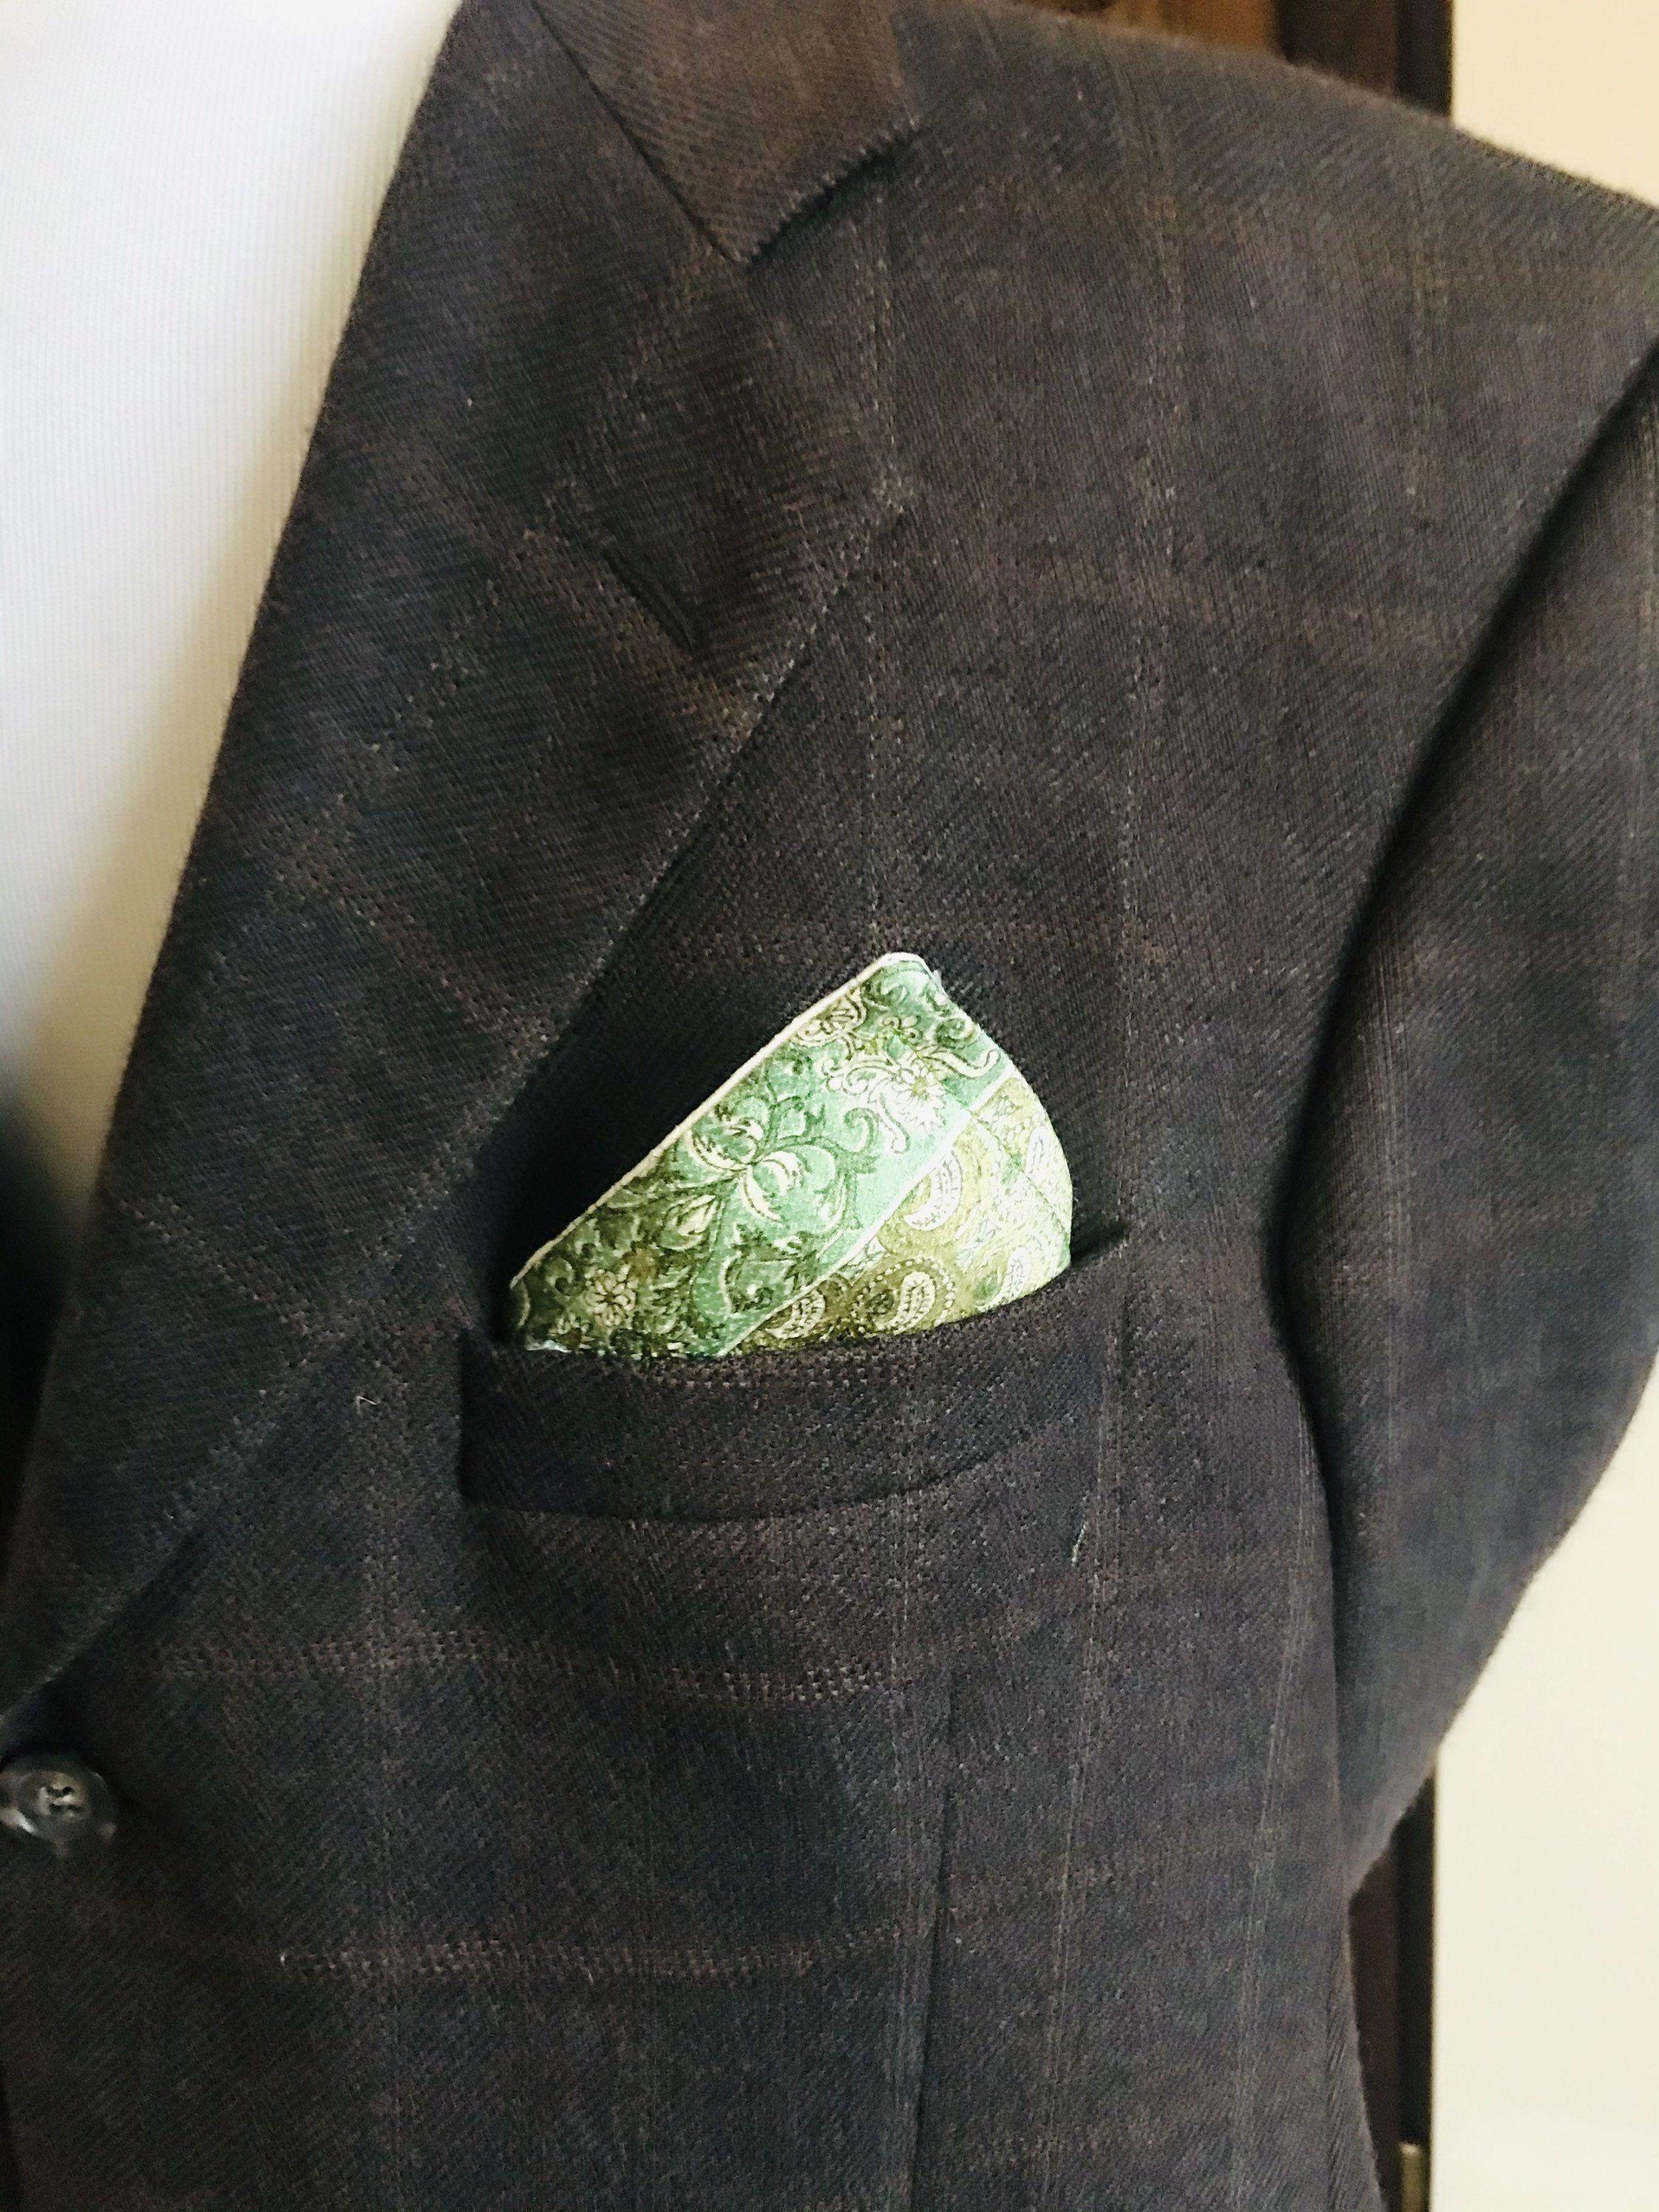 Blue and White Pocket Square Reversible Men/'s Suit Accessory Vintage Japanese Kimono Fabric